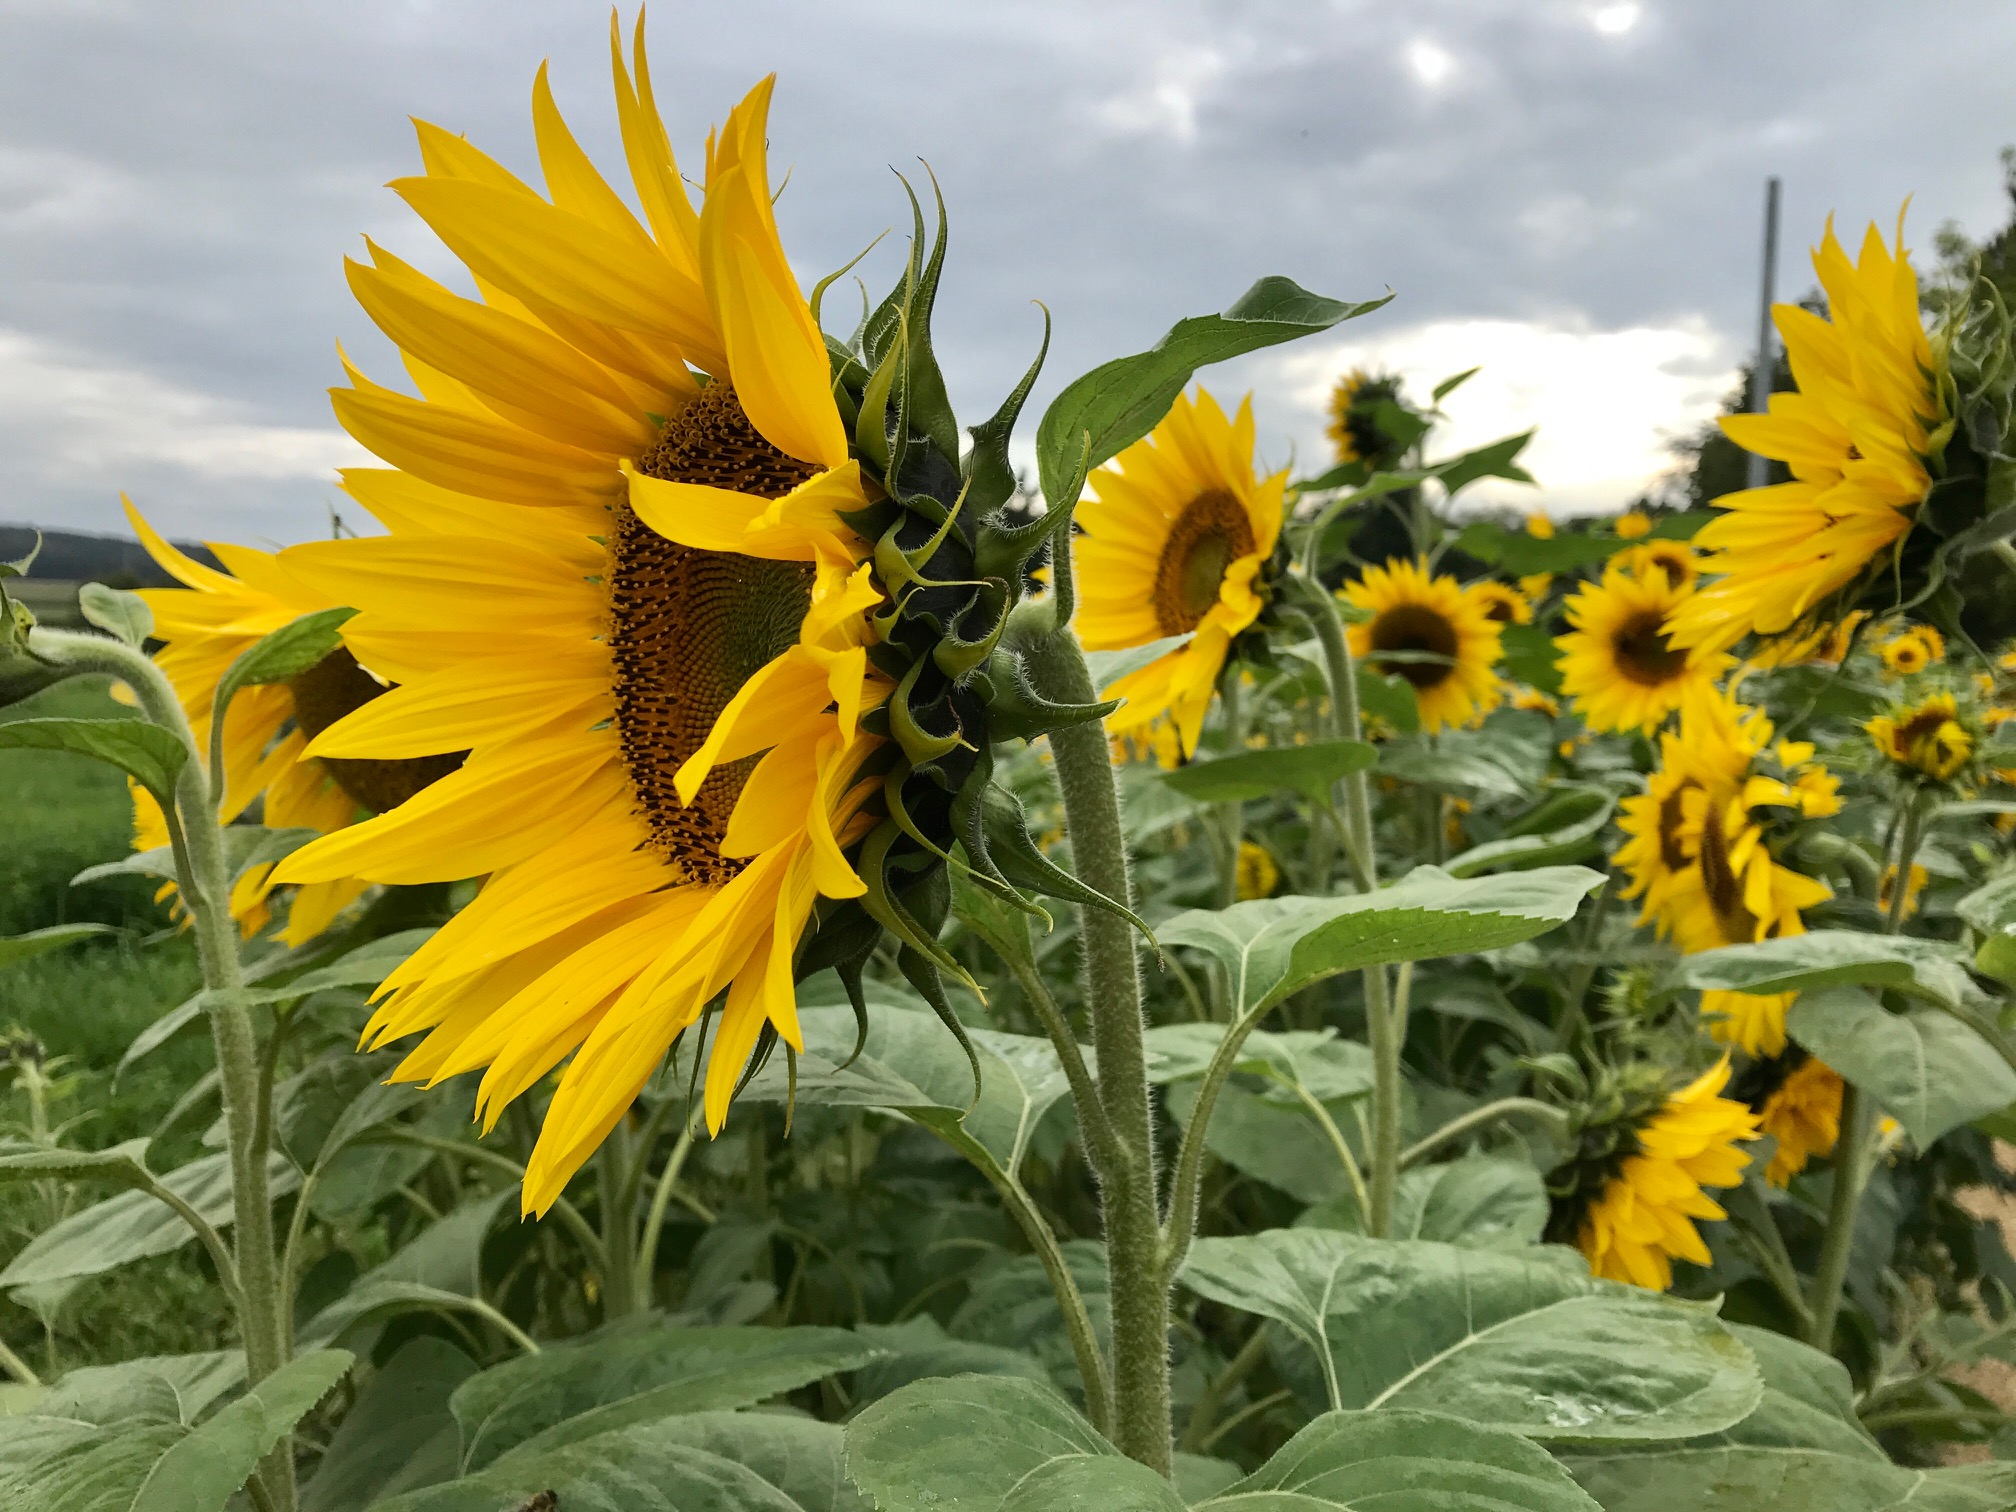 Sonnenblumenfeld am Ortsausgang von Lauterbach, HW1 Etappe 4 nach Heubach